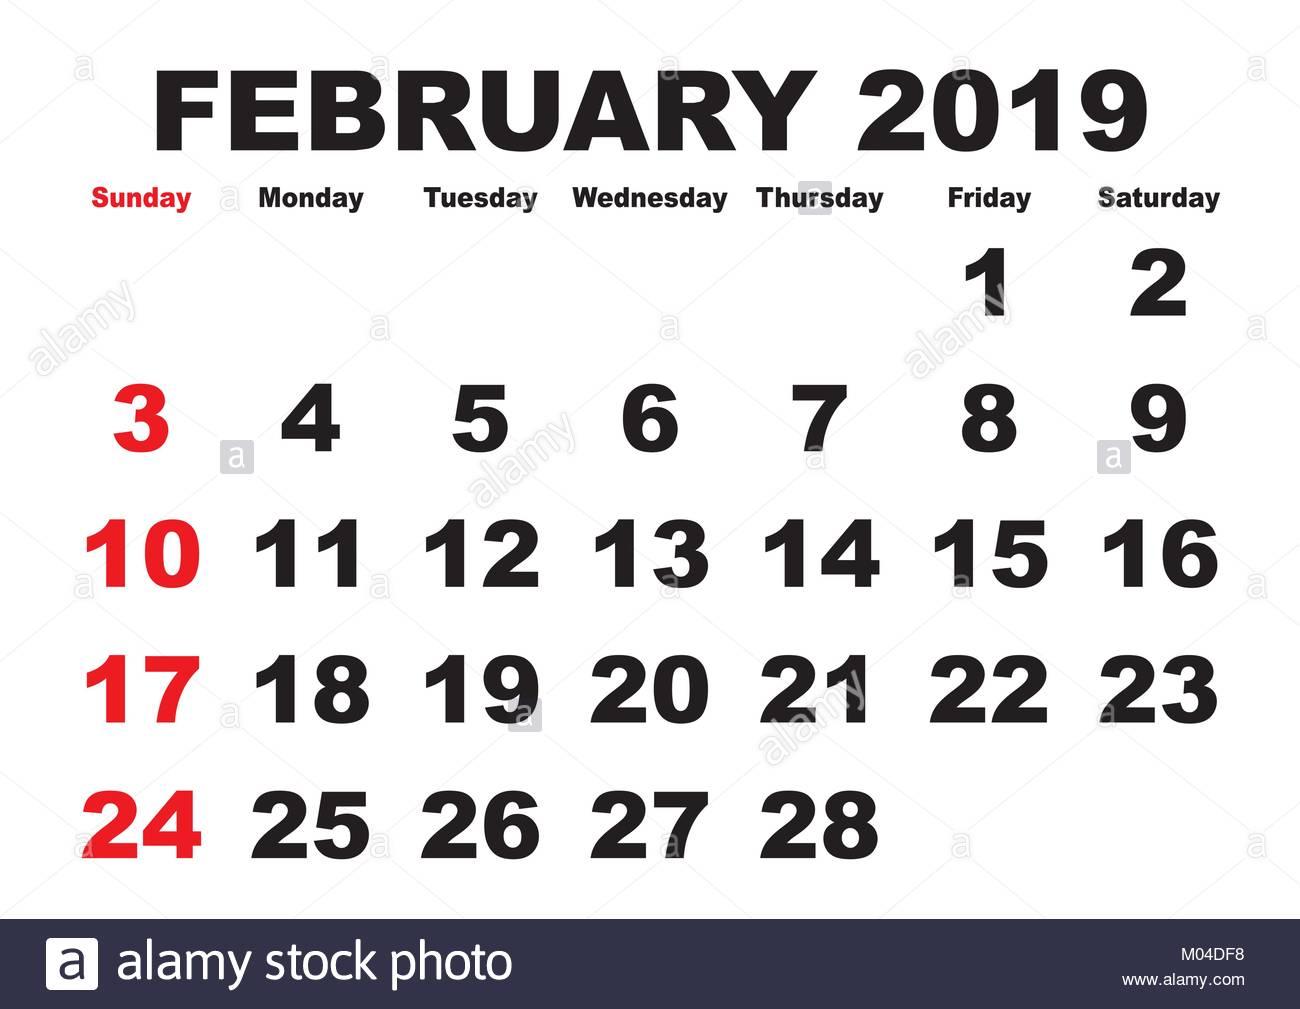 2019 Kalender Februar Monat. Vektor druckbare Kalender. Monatliche ...